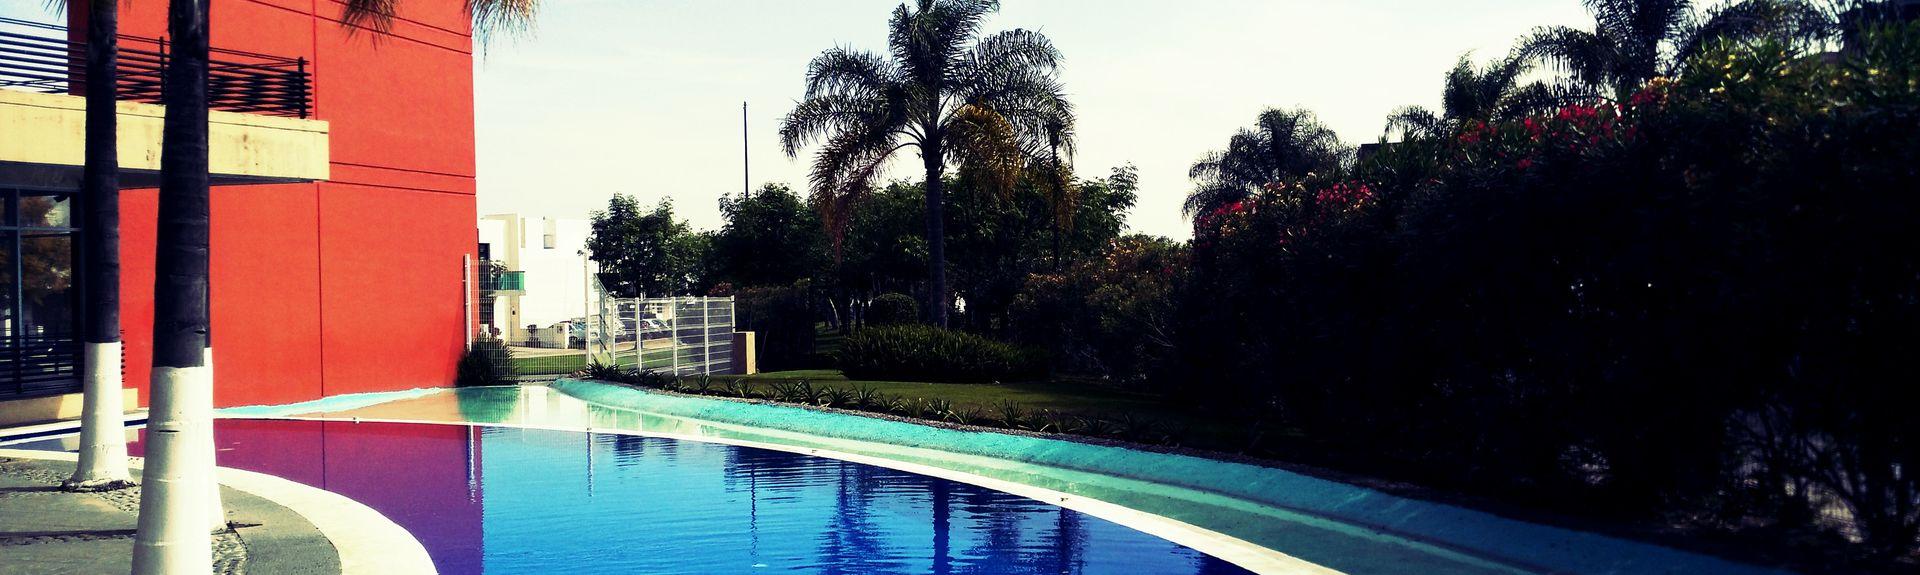 Zapopan, Jal., Mexico